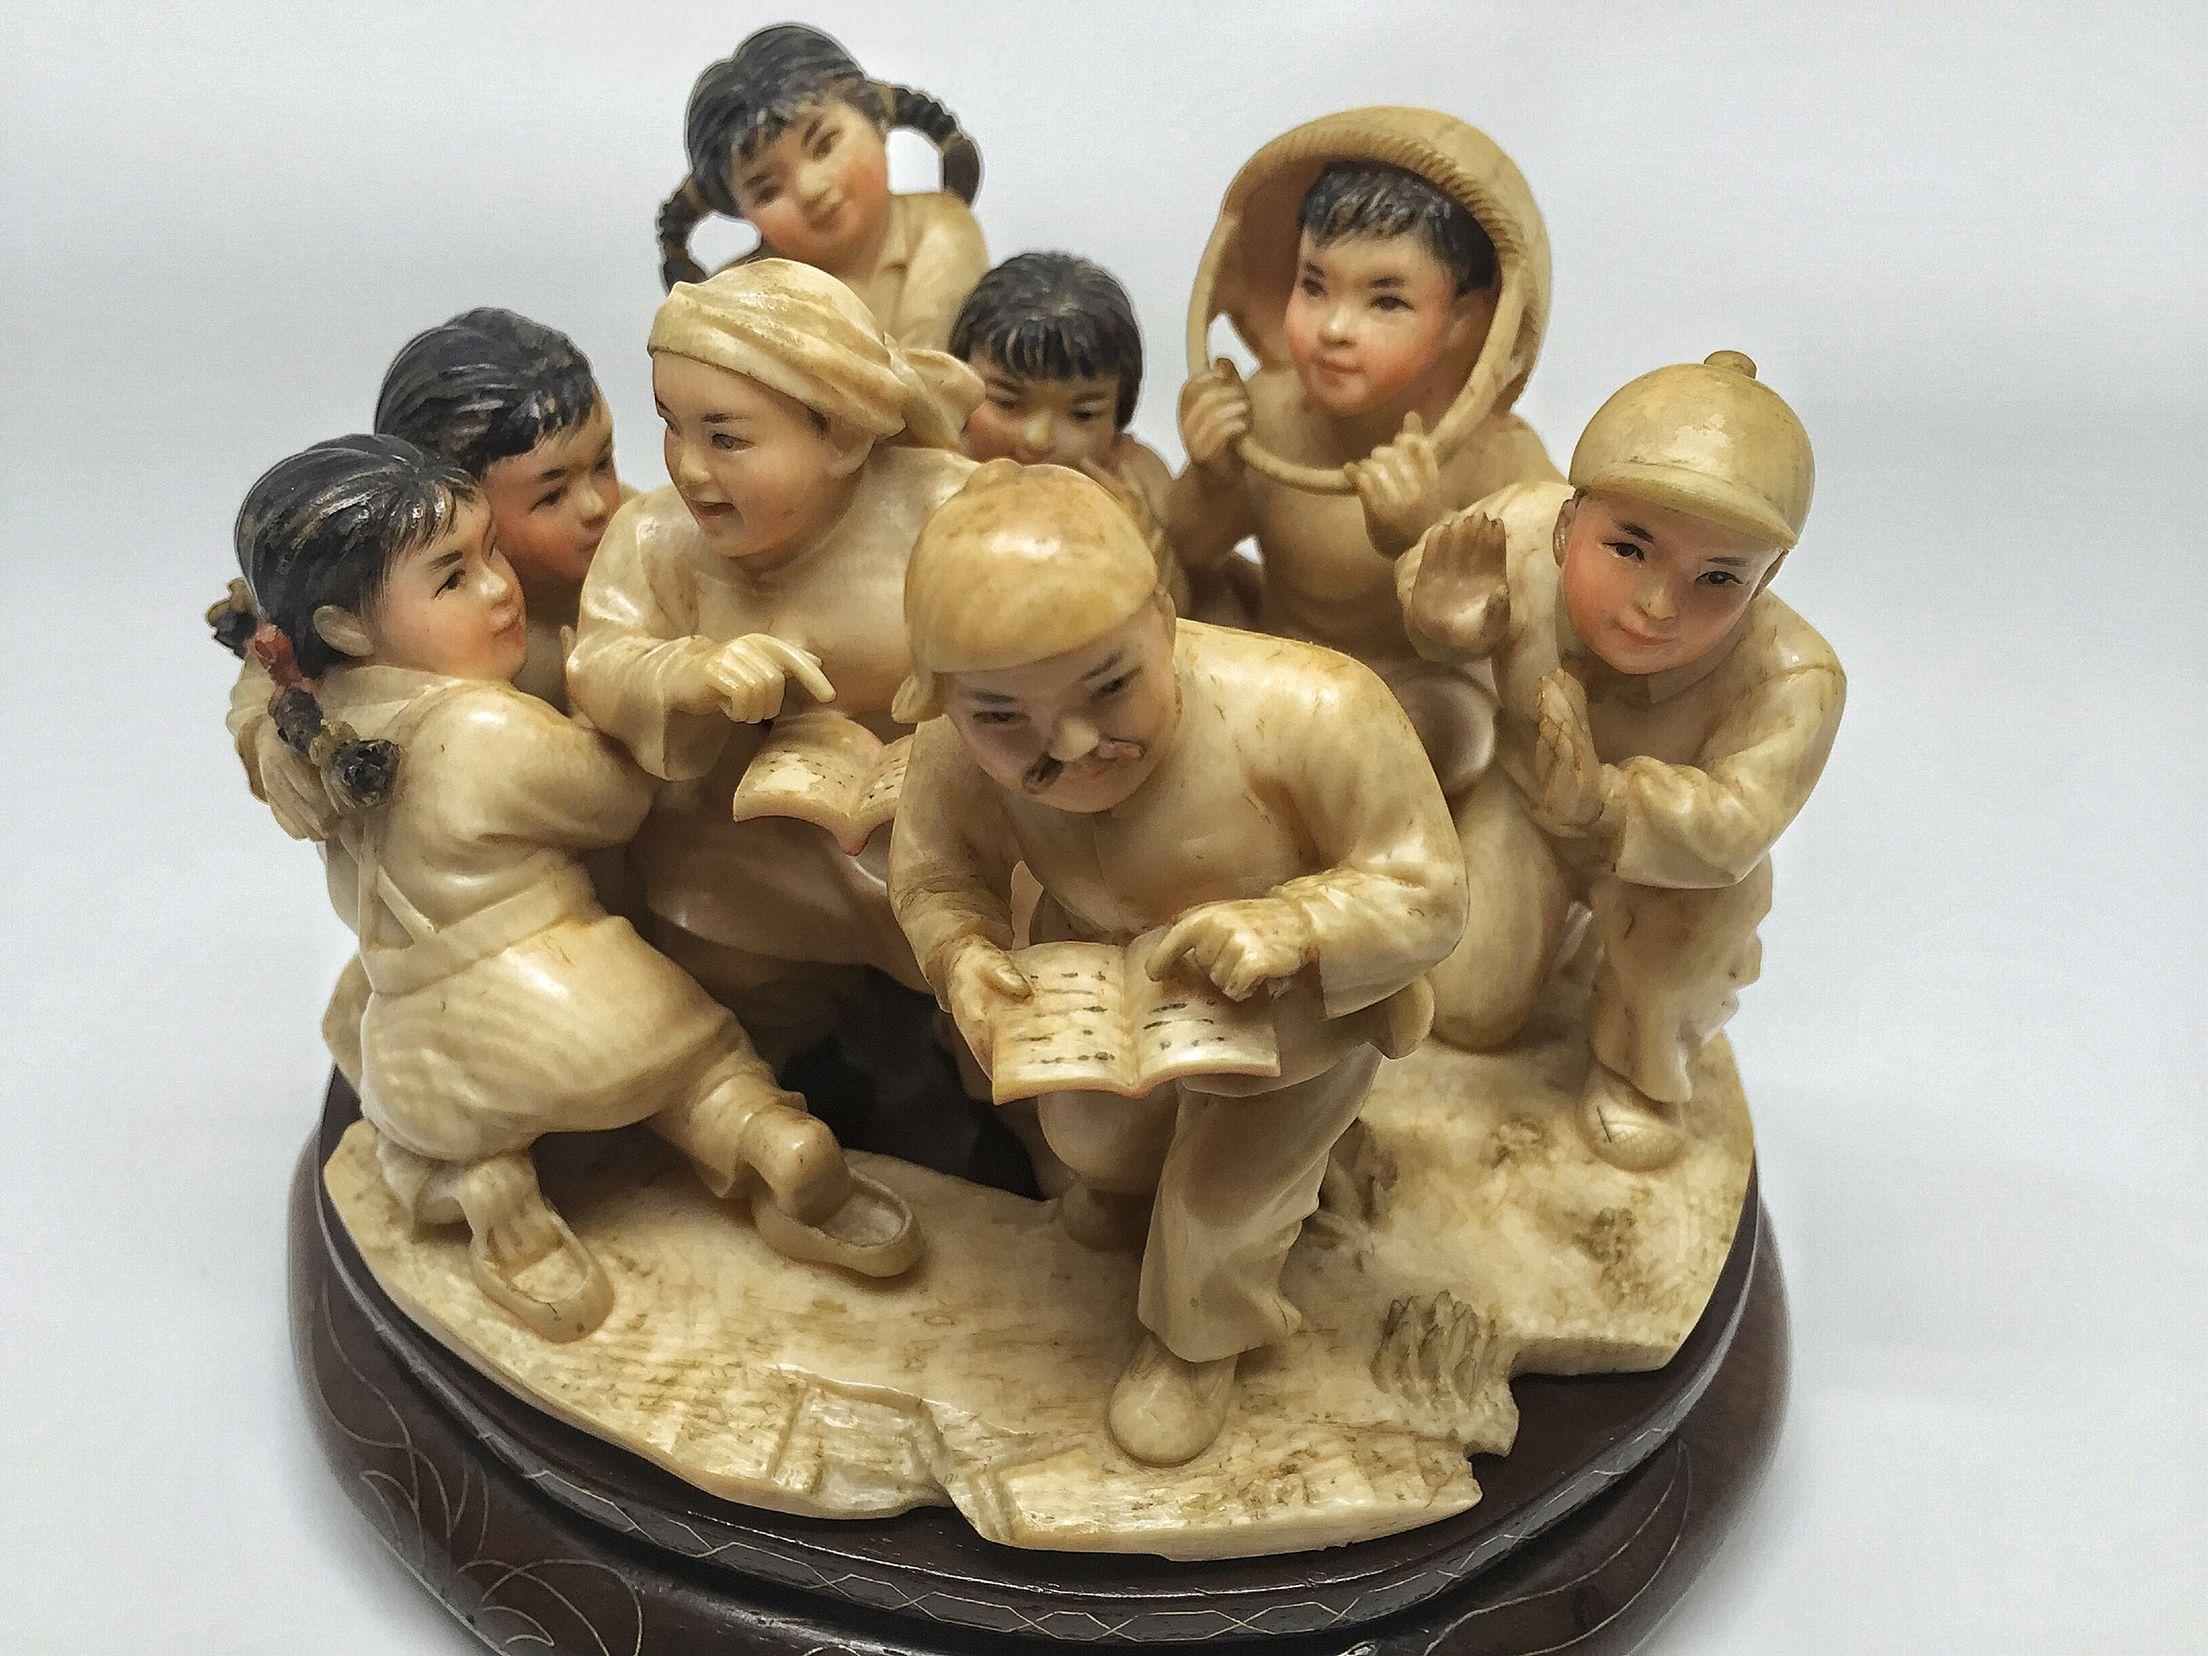 Pin on Chinese Arts